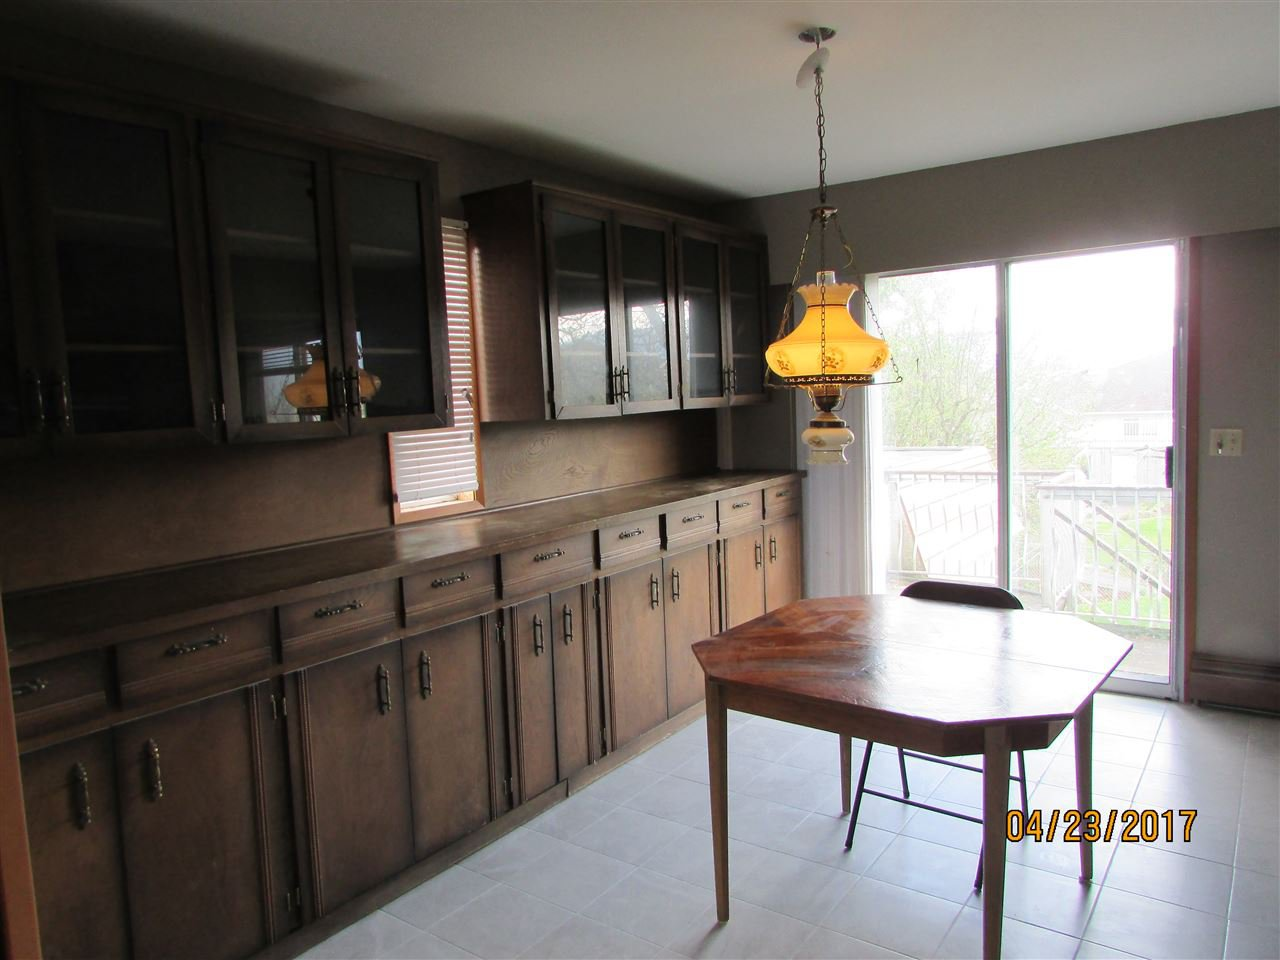 Photo 9: Photos: 7220 EVANS Road in Sardis: Sardis West Vedder Rd House for sale : MLS®# R2160379